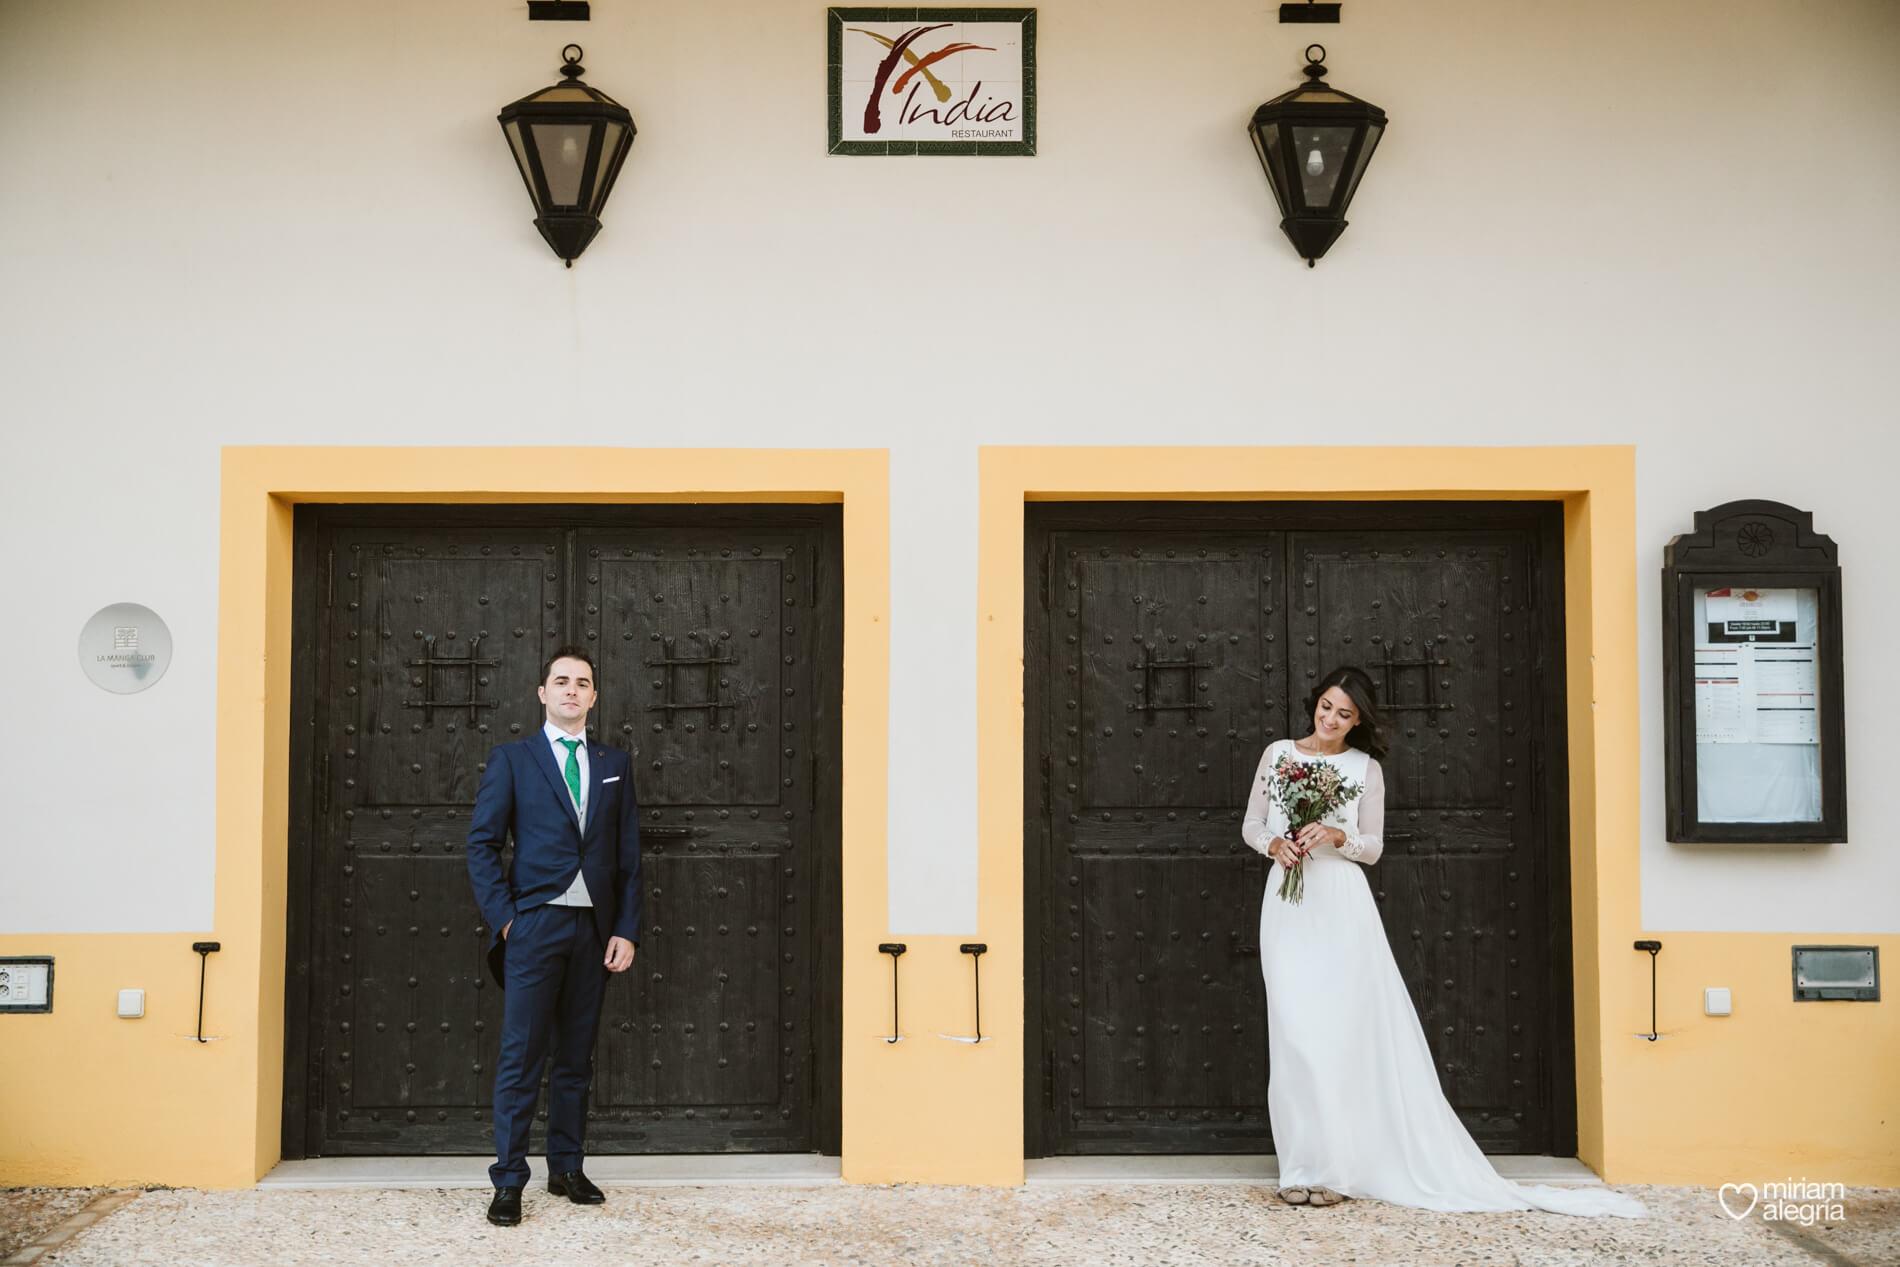 boda-en-iglesia-del-carmen-cartagena-231